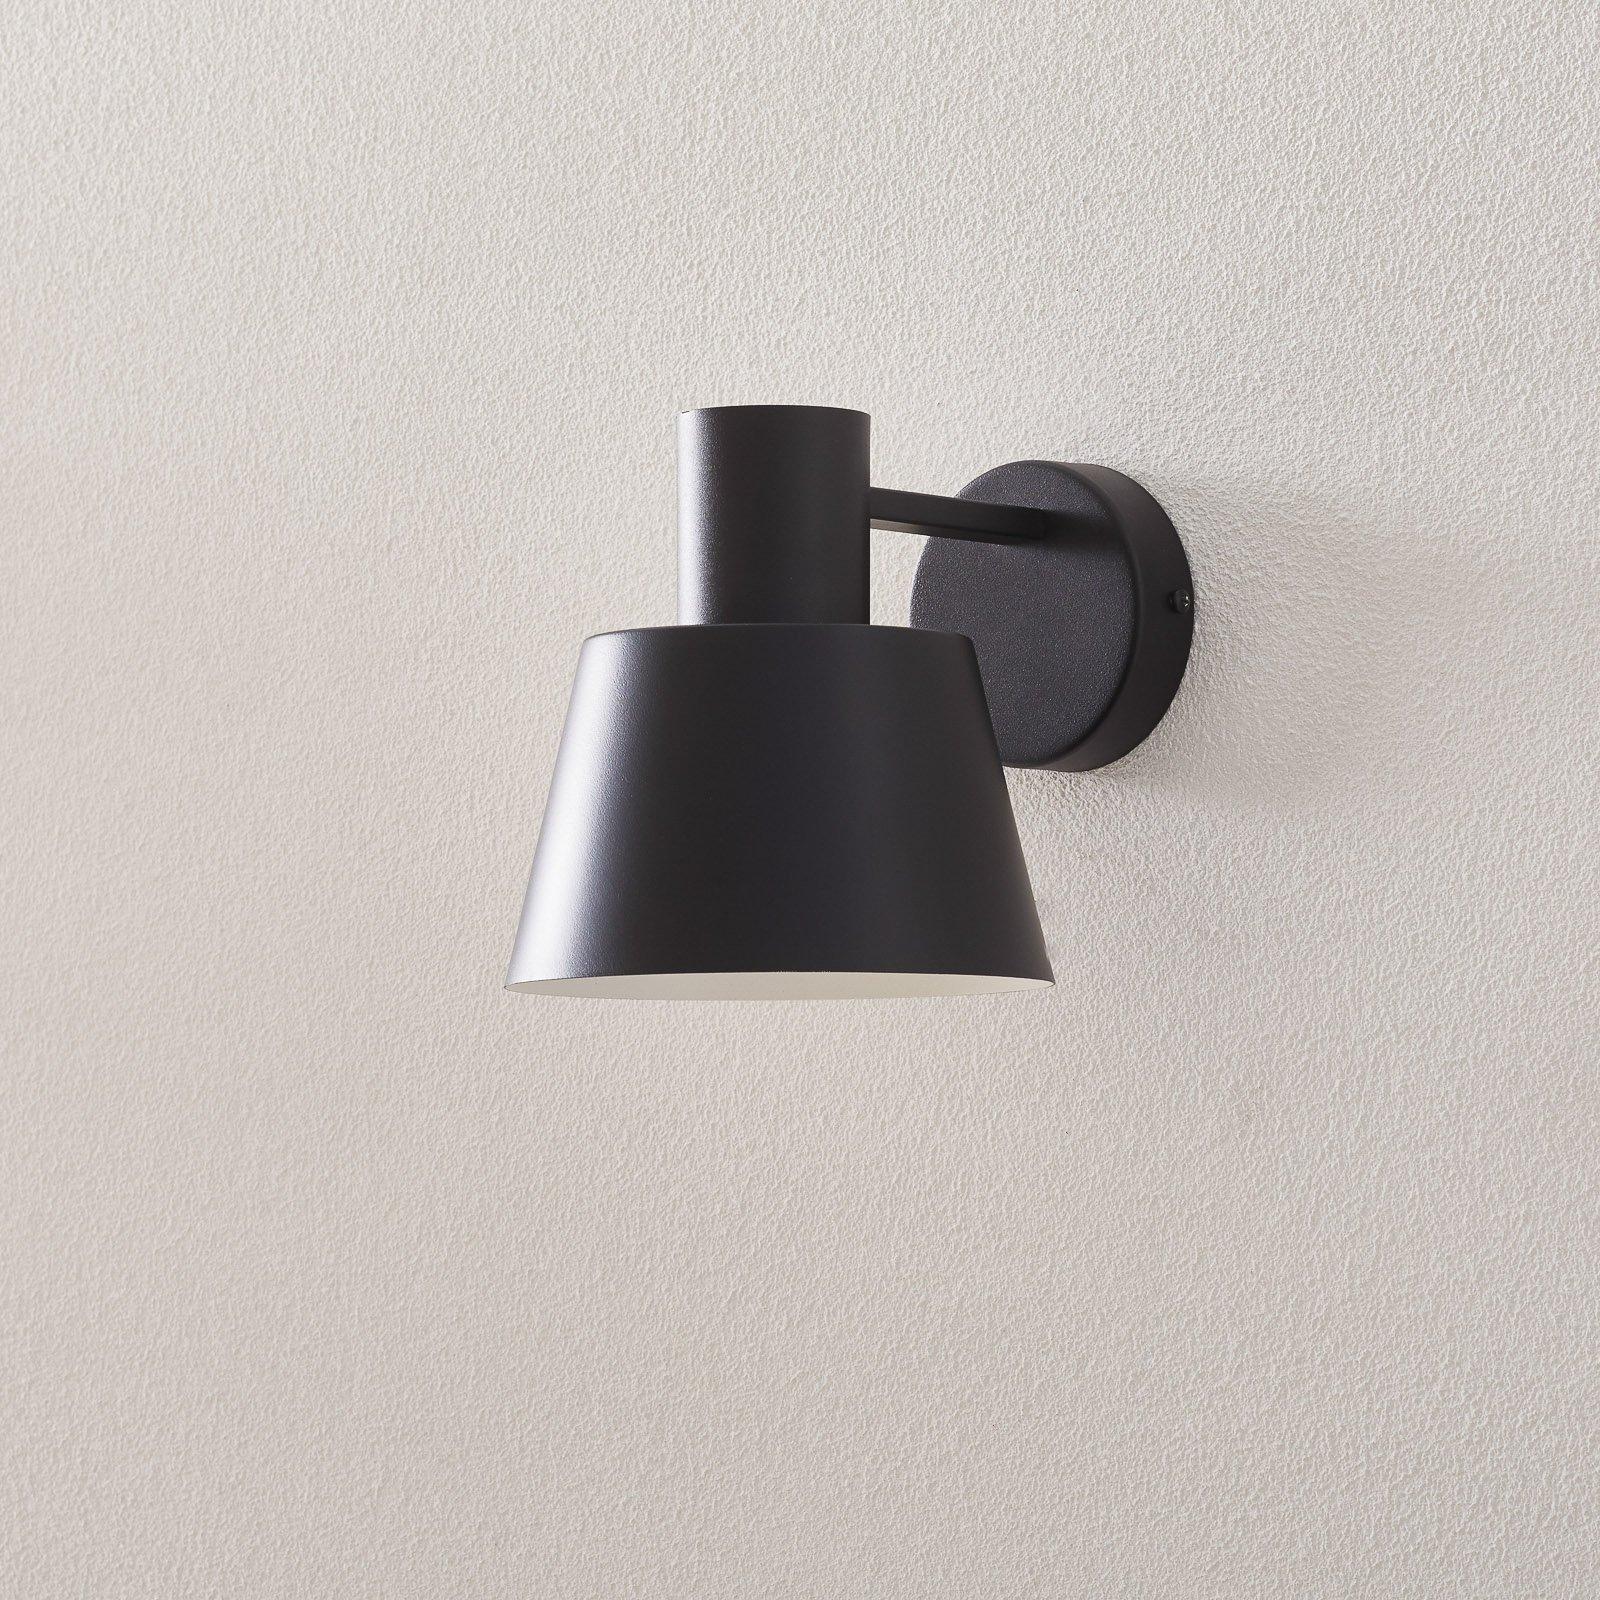 Vegglampe Dunka i metal, 1 lyskilde, svart